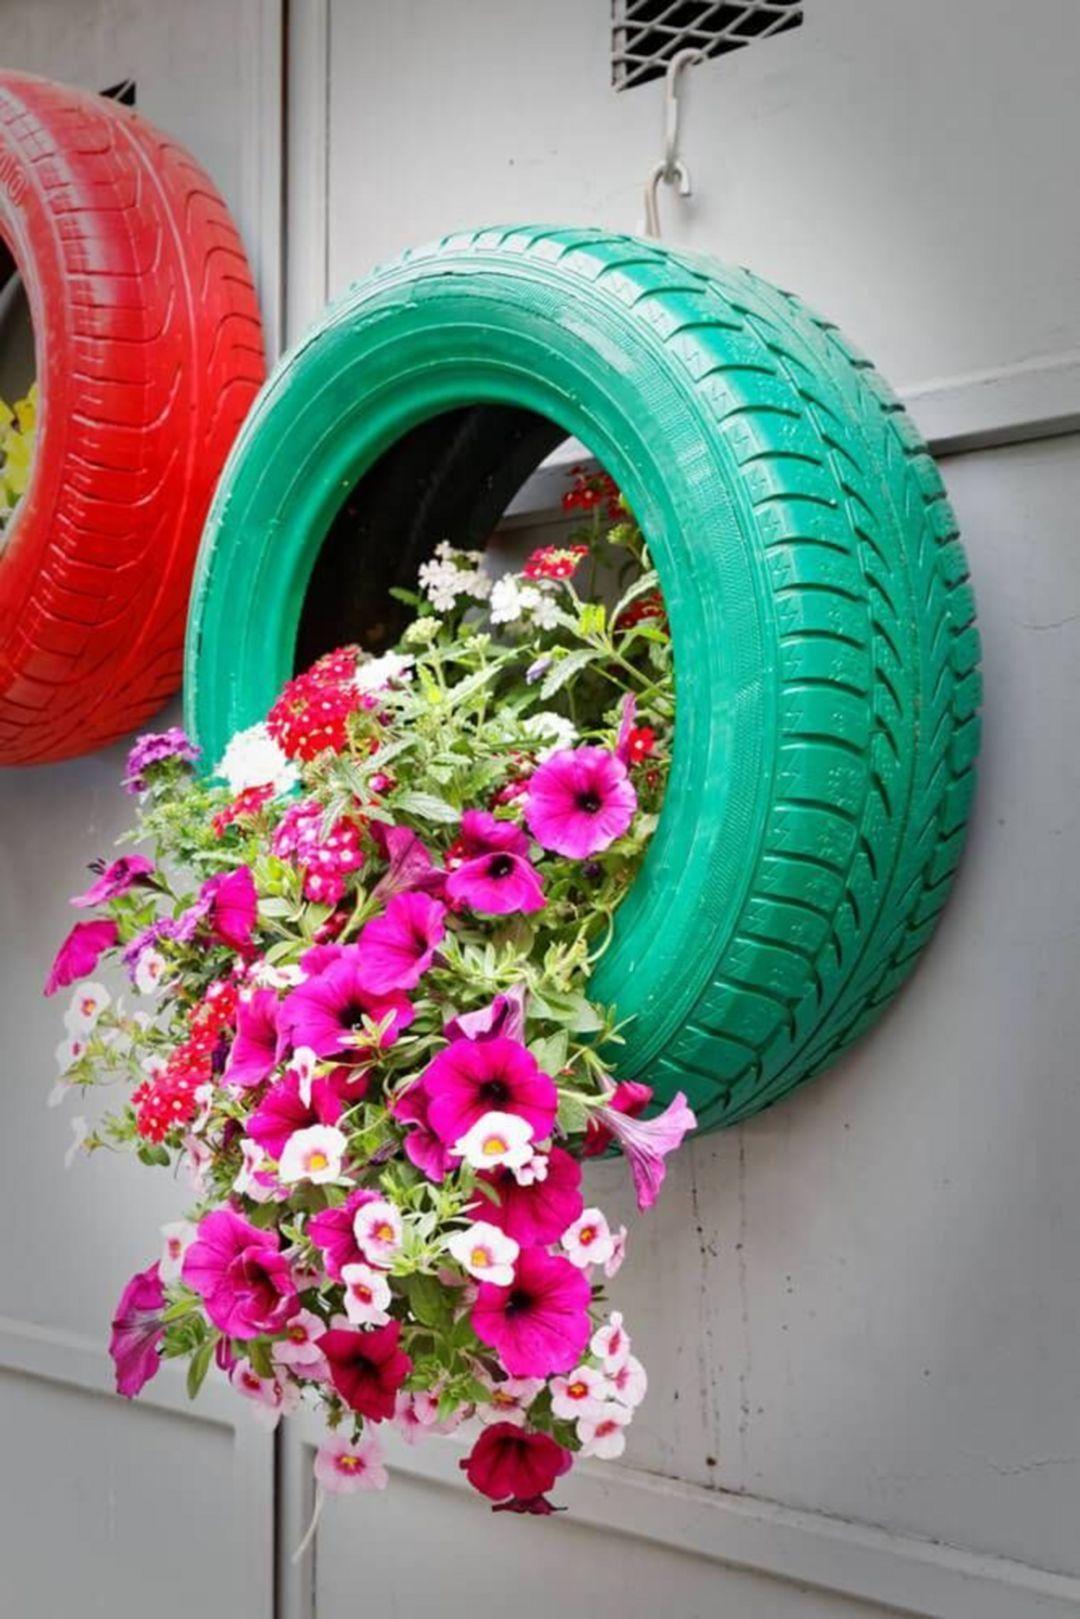 30 impressive diy tire planters ideas for your garden to